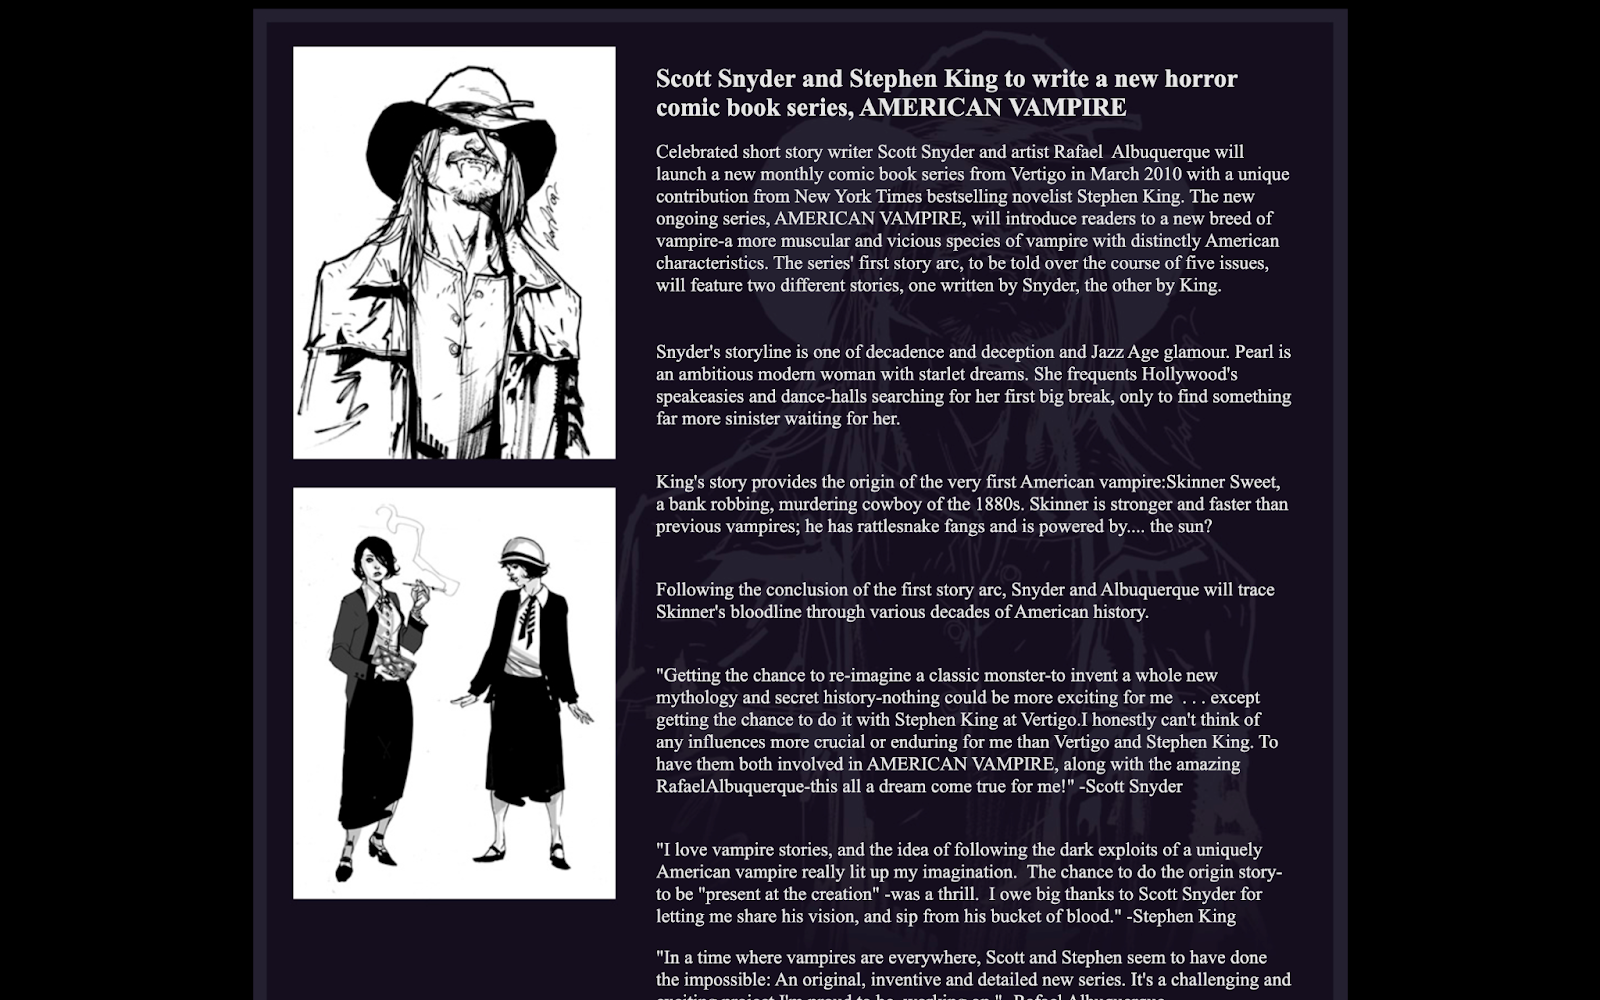 American Vampire Press Release